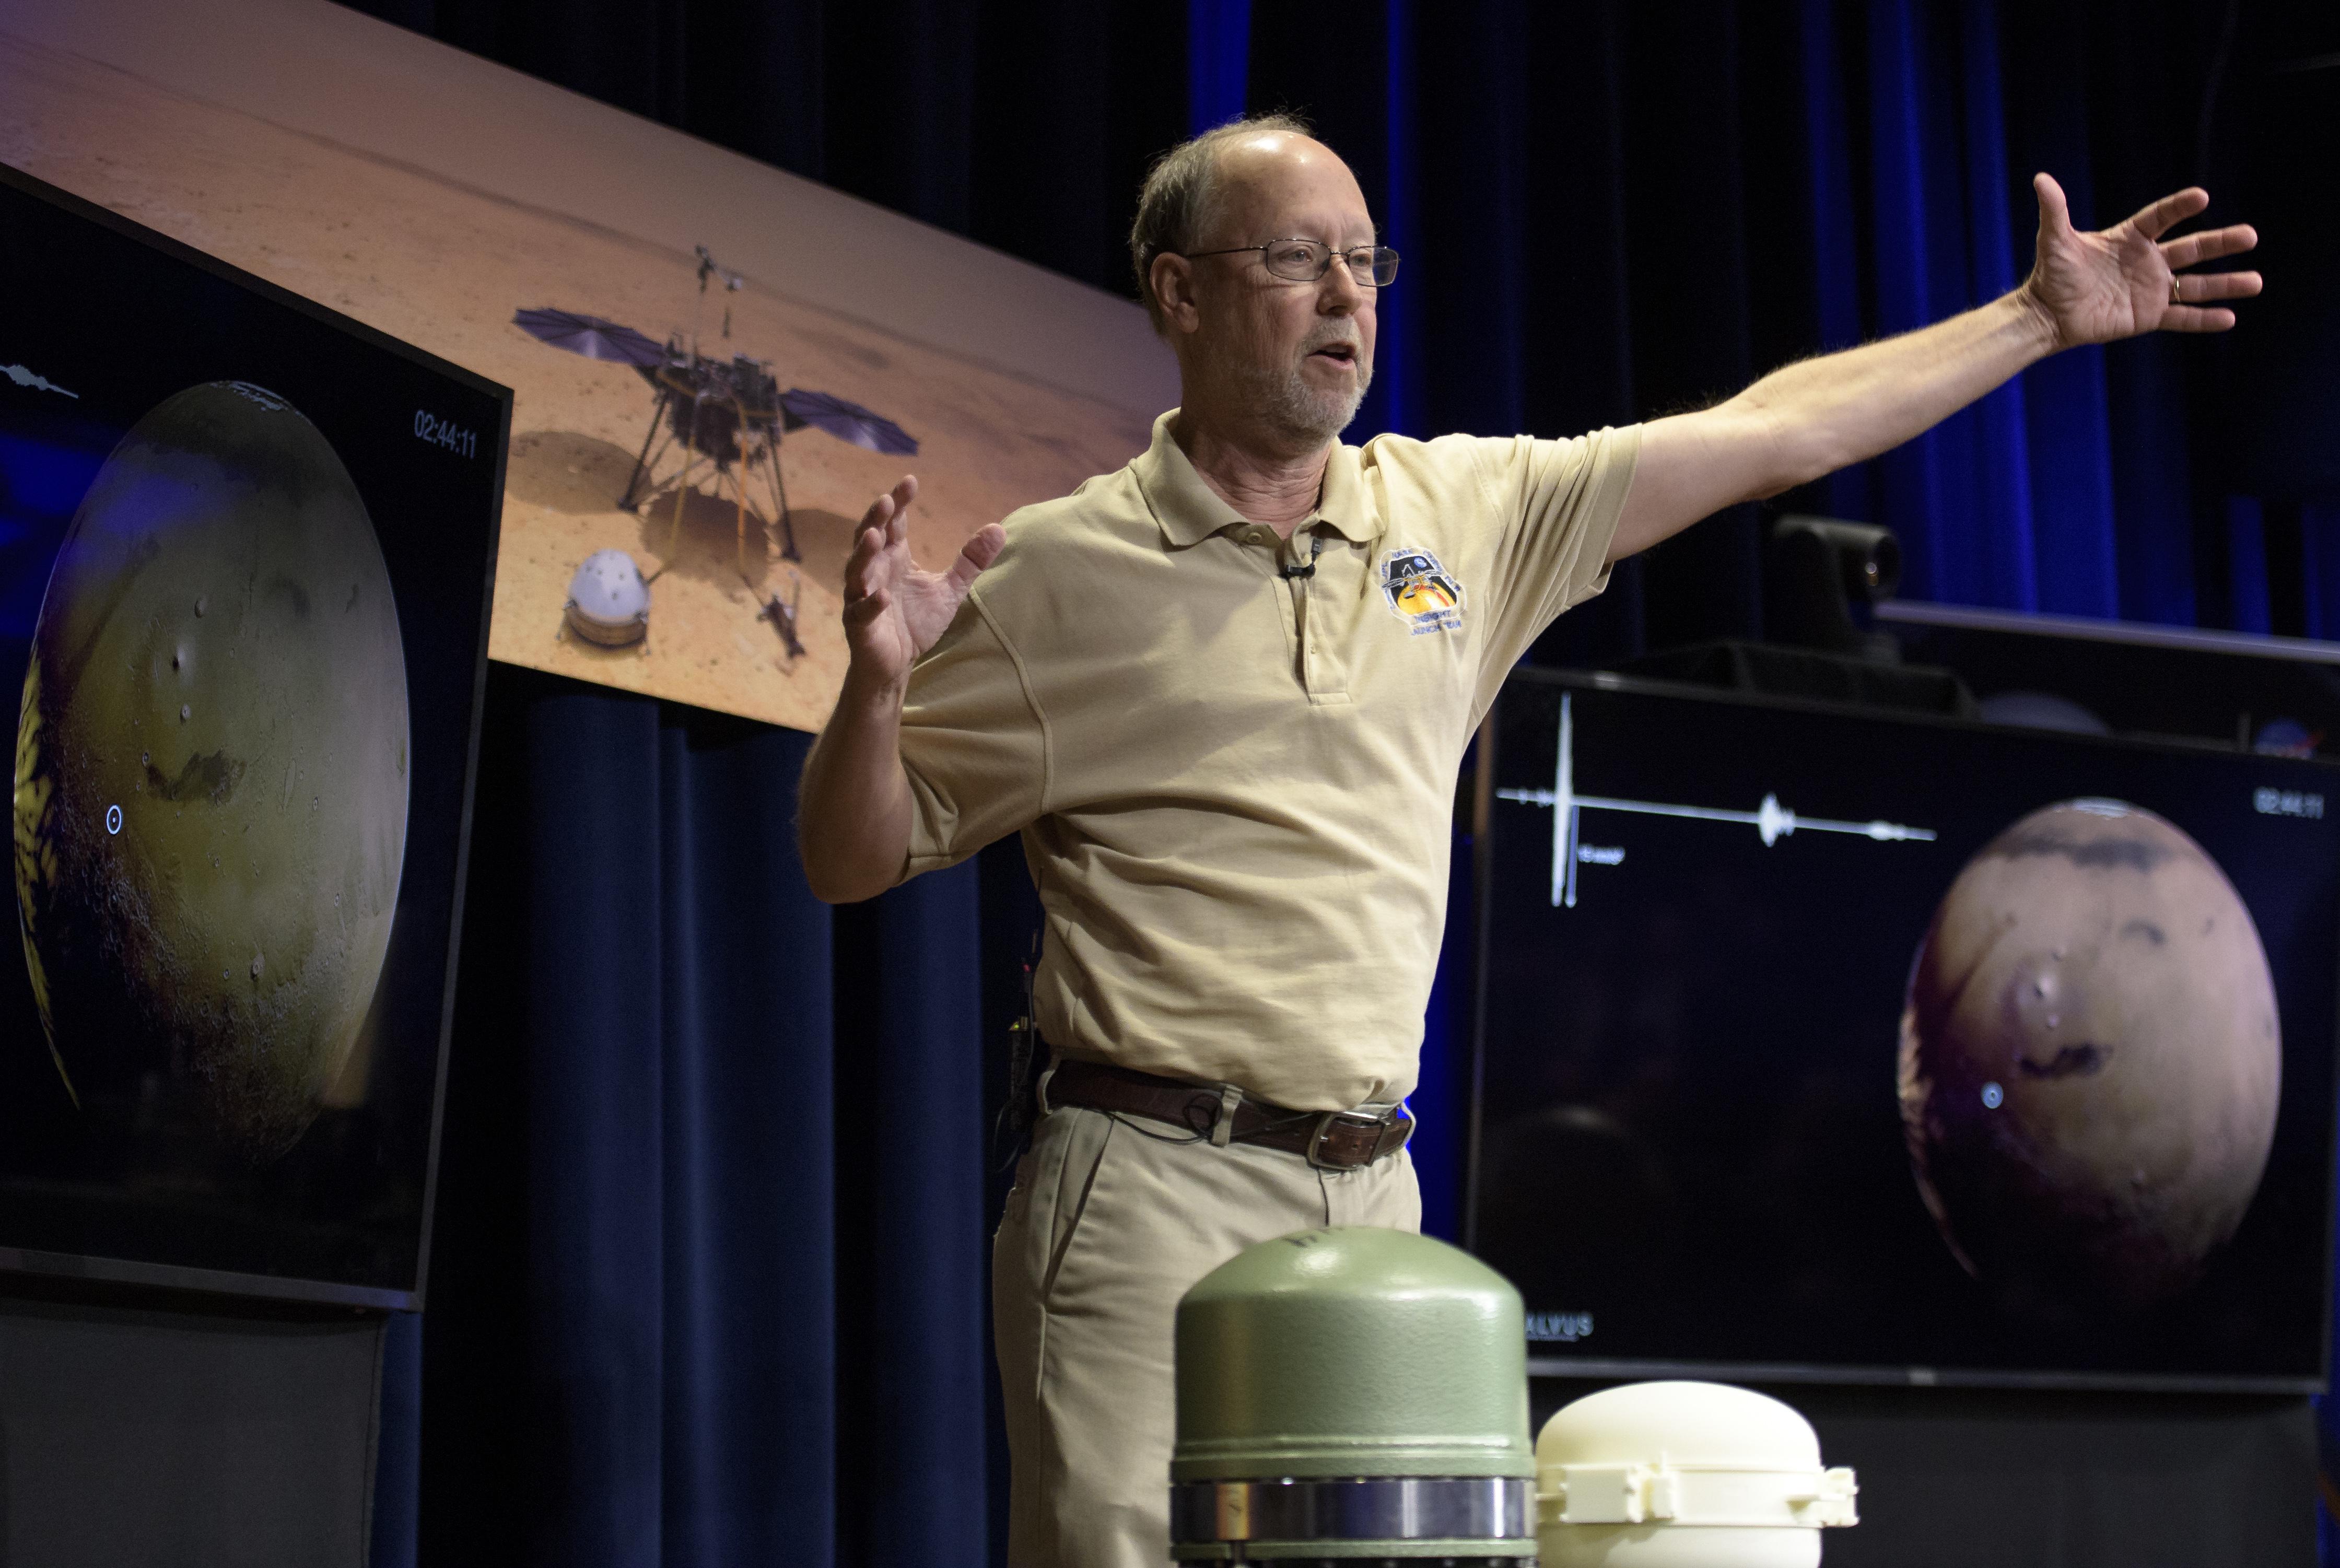 Bruce Banerdt, InSight Principal Investigator, NASA JPL, talks about Mars InSight during a pre-landing briefing, Sunday, Nov. 25, 2018 at NASA's Jet Propulsion Laboratory in Pasadena, Calif. InSight, short for Interior Exploration using Seismic Investigations, Geodesy and Heat Transport, is a Mars lander designed to study the